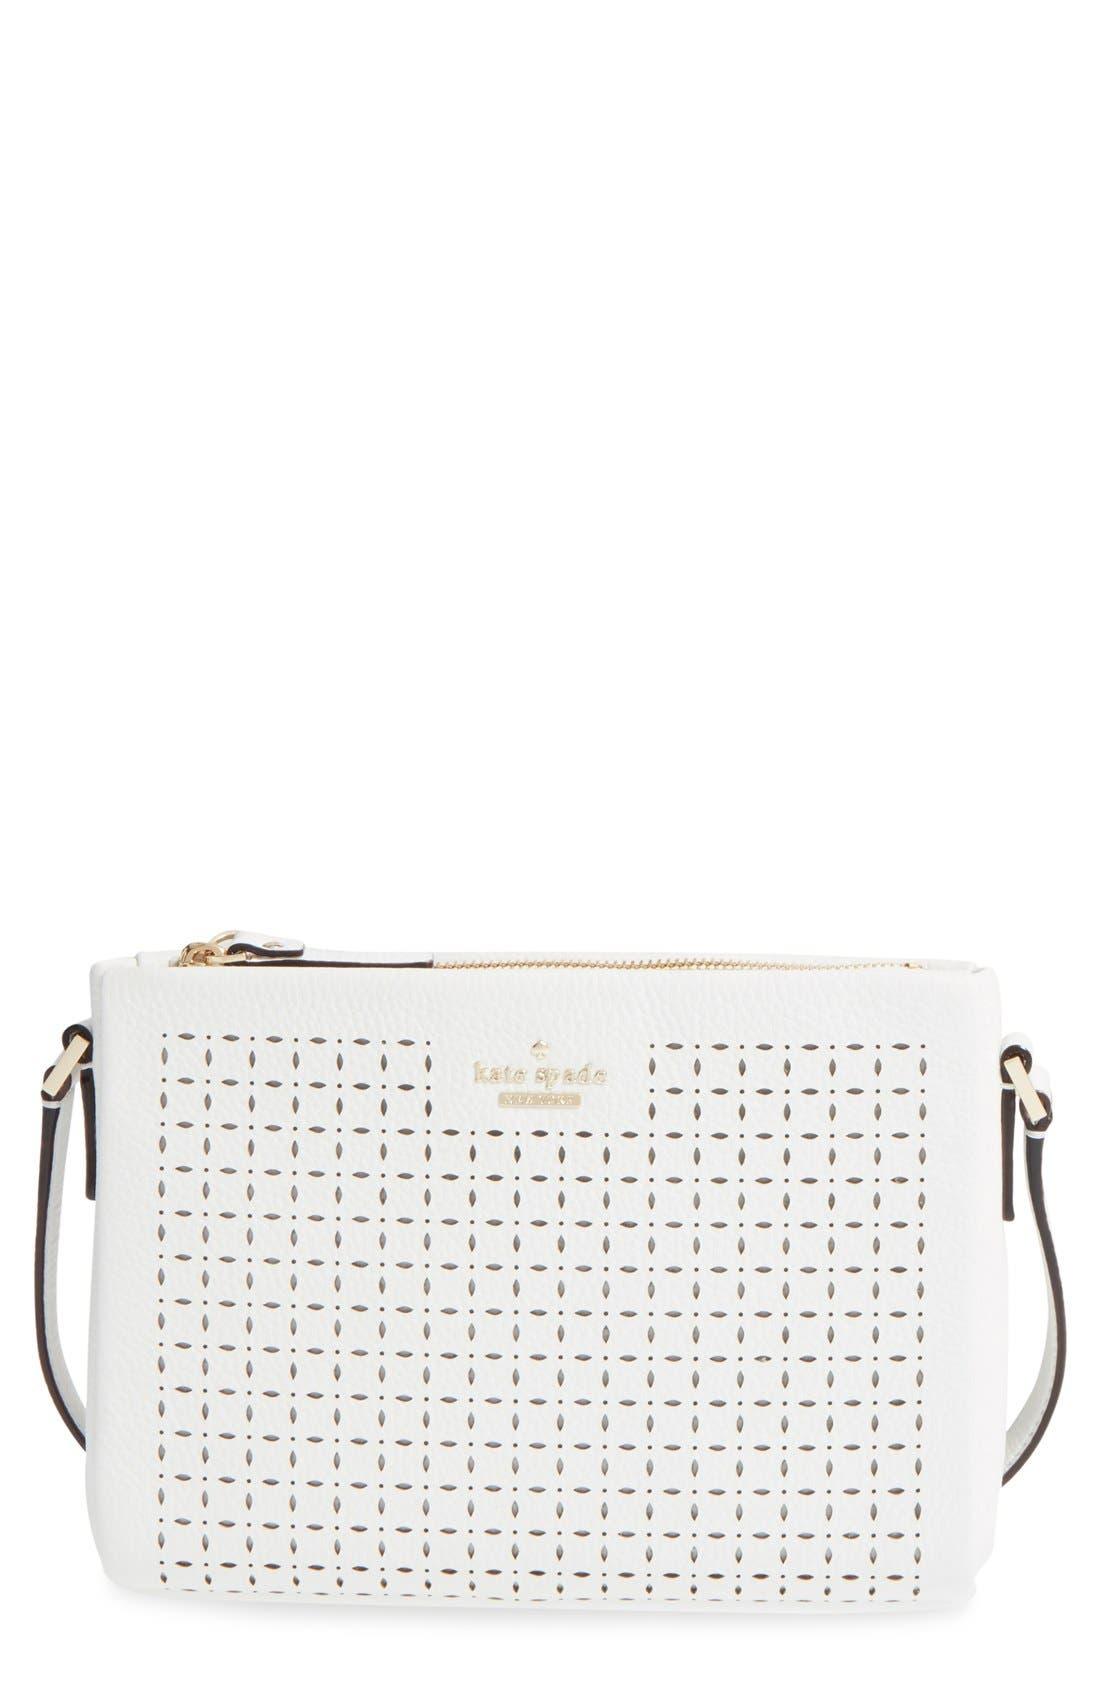 KATE SPADE NEW YORK, 'milton lane - lilibeth' perforated leather crossbody bag, Main thumbnail 1, color, 100